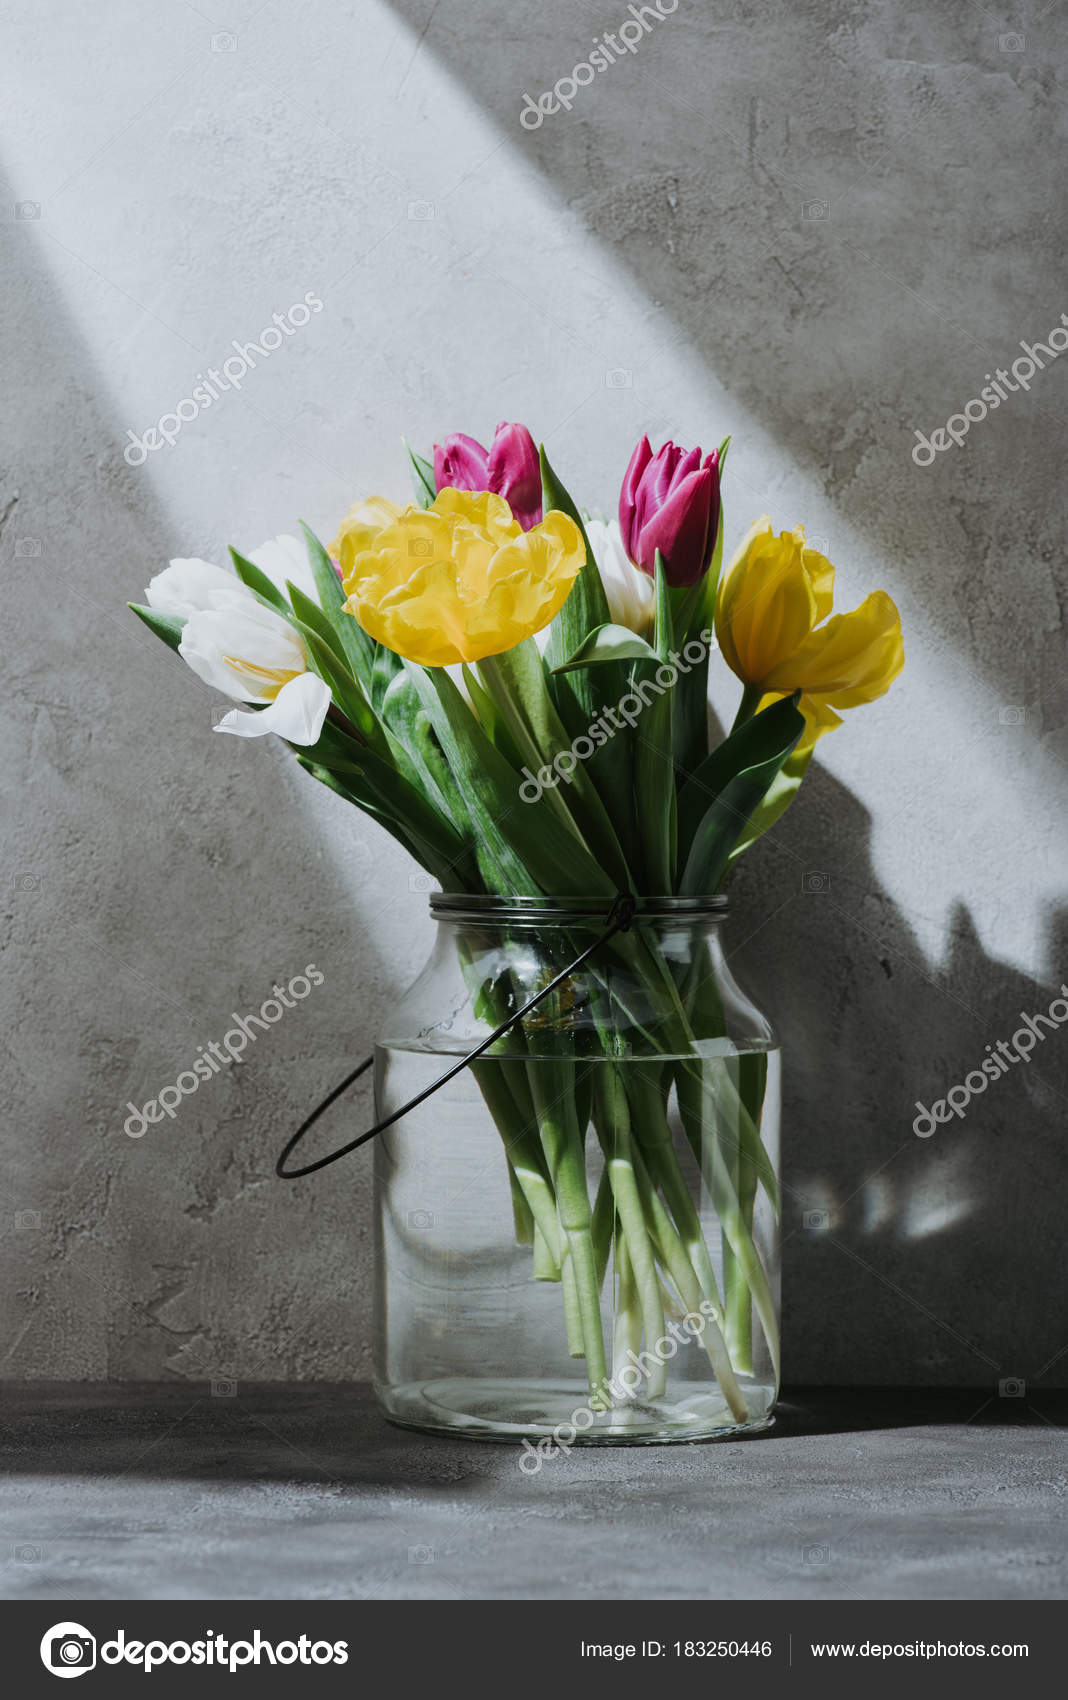 ab2b8bd7b08e0 Spring Tulip Flowers Glass Jar Concrete Surface Shadow — Stock Photo ...